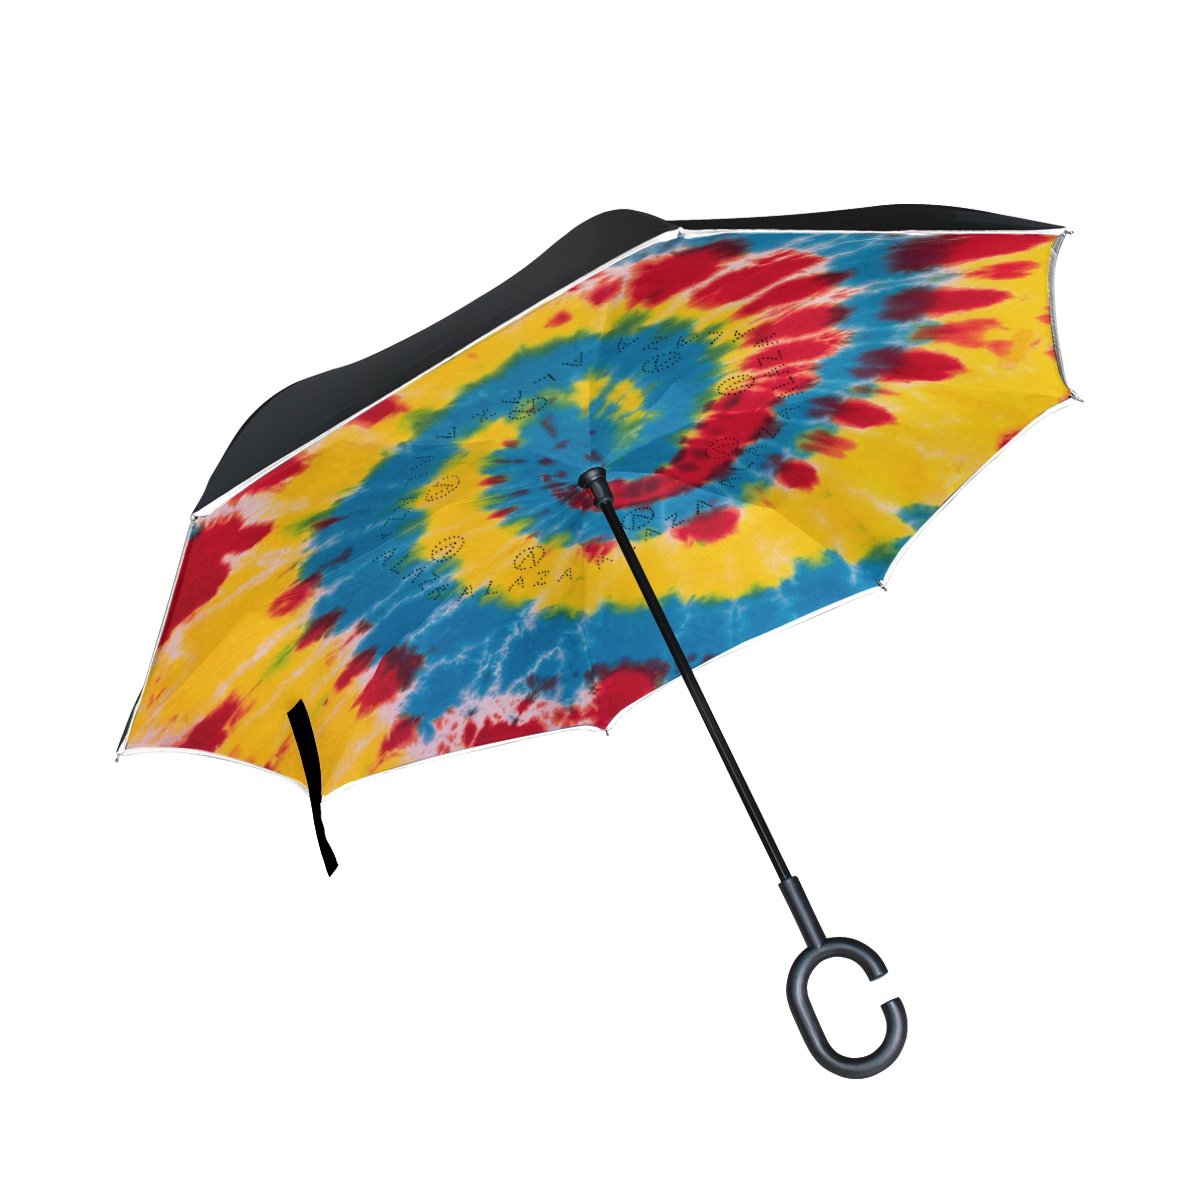 Alaza Colorful Tie Dye SwirlスパイラルInverted傘二層防風Reverse折り畳み傘for Car with c-shapeハンドル   B076CCT4SD